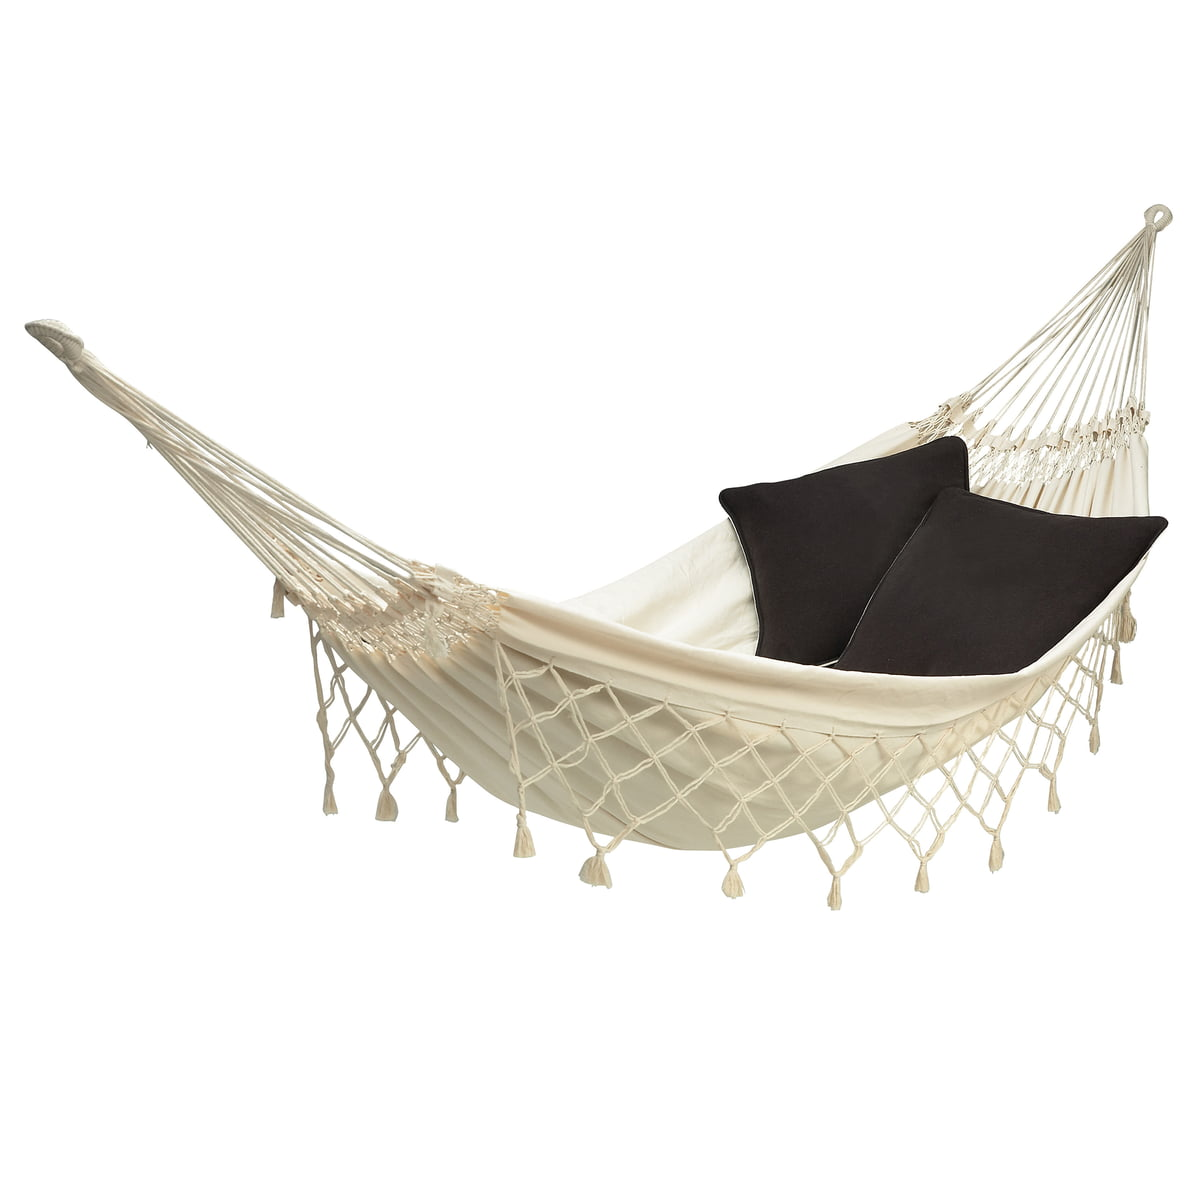 sambito h ngematte von skagerak connox. Black Bedroom Furniture Sets. Home Design Ideas